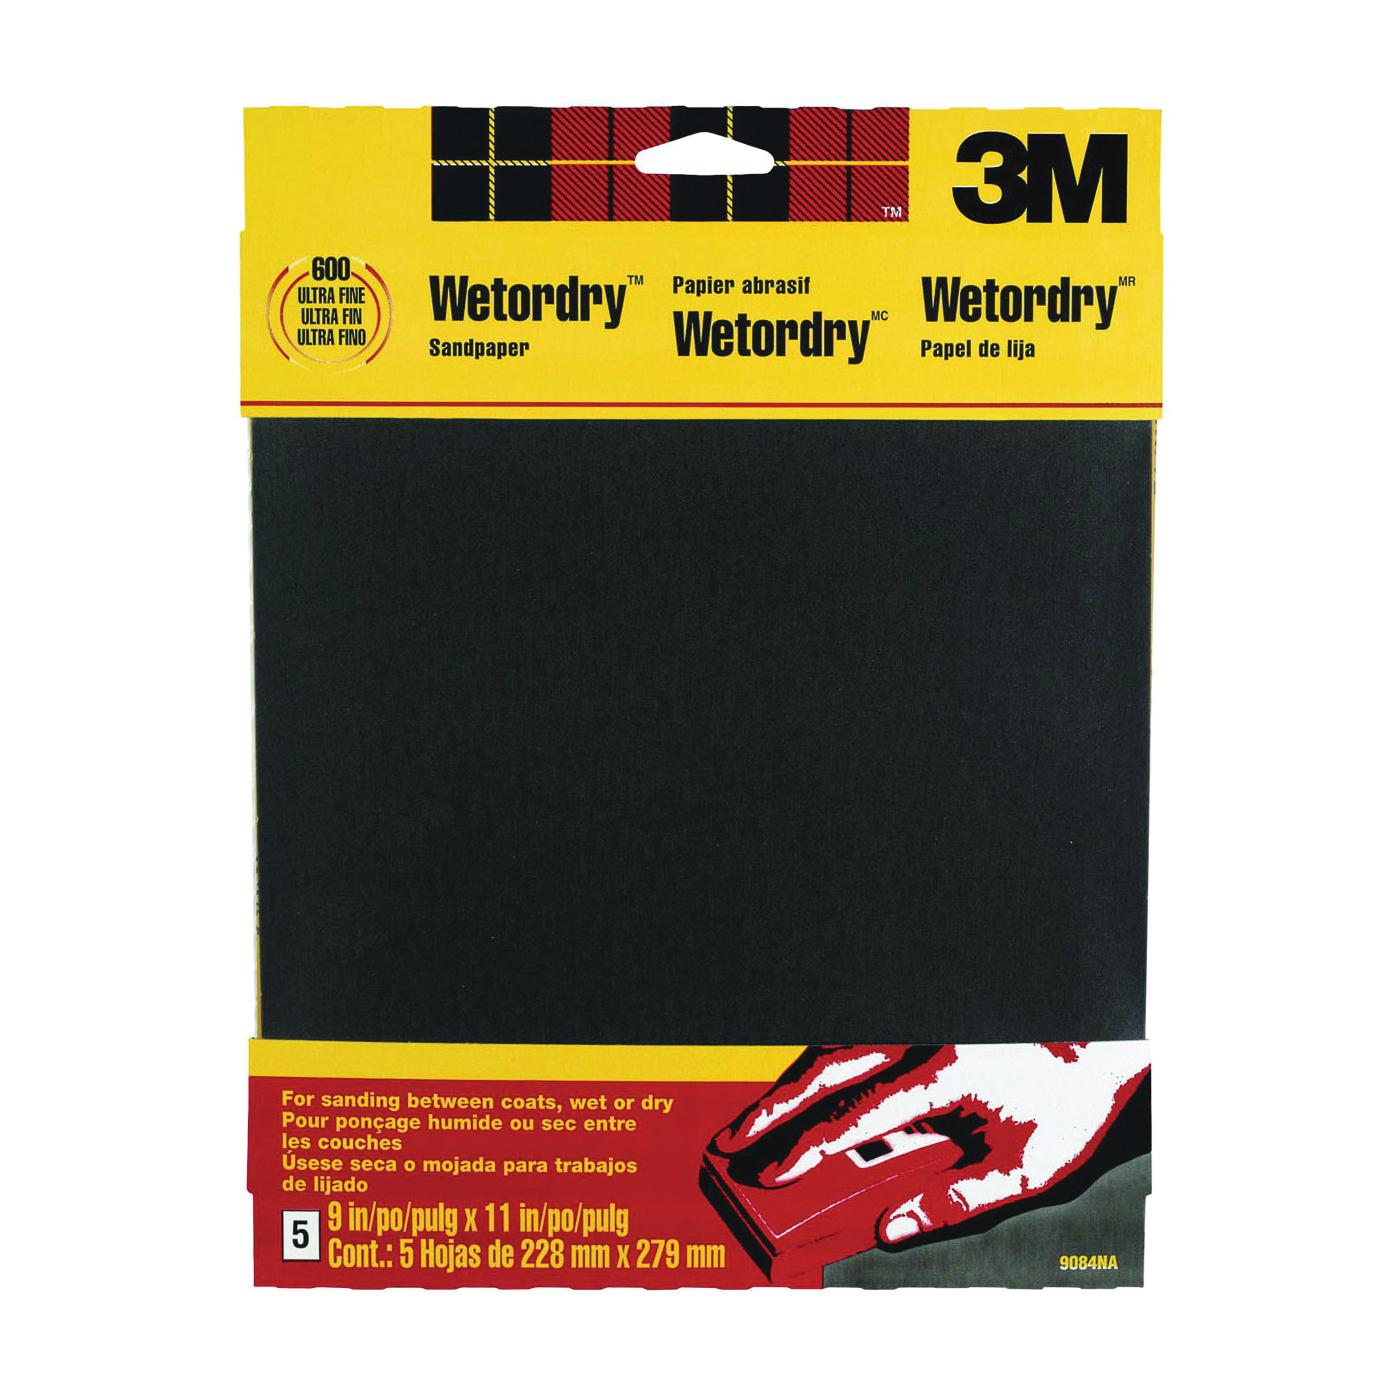 Picture of 3M 9084 Sandpaper, 11 in L, 9 in W, 600 Grit, Ultra Fine, Silicone Carbide Abrasive